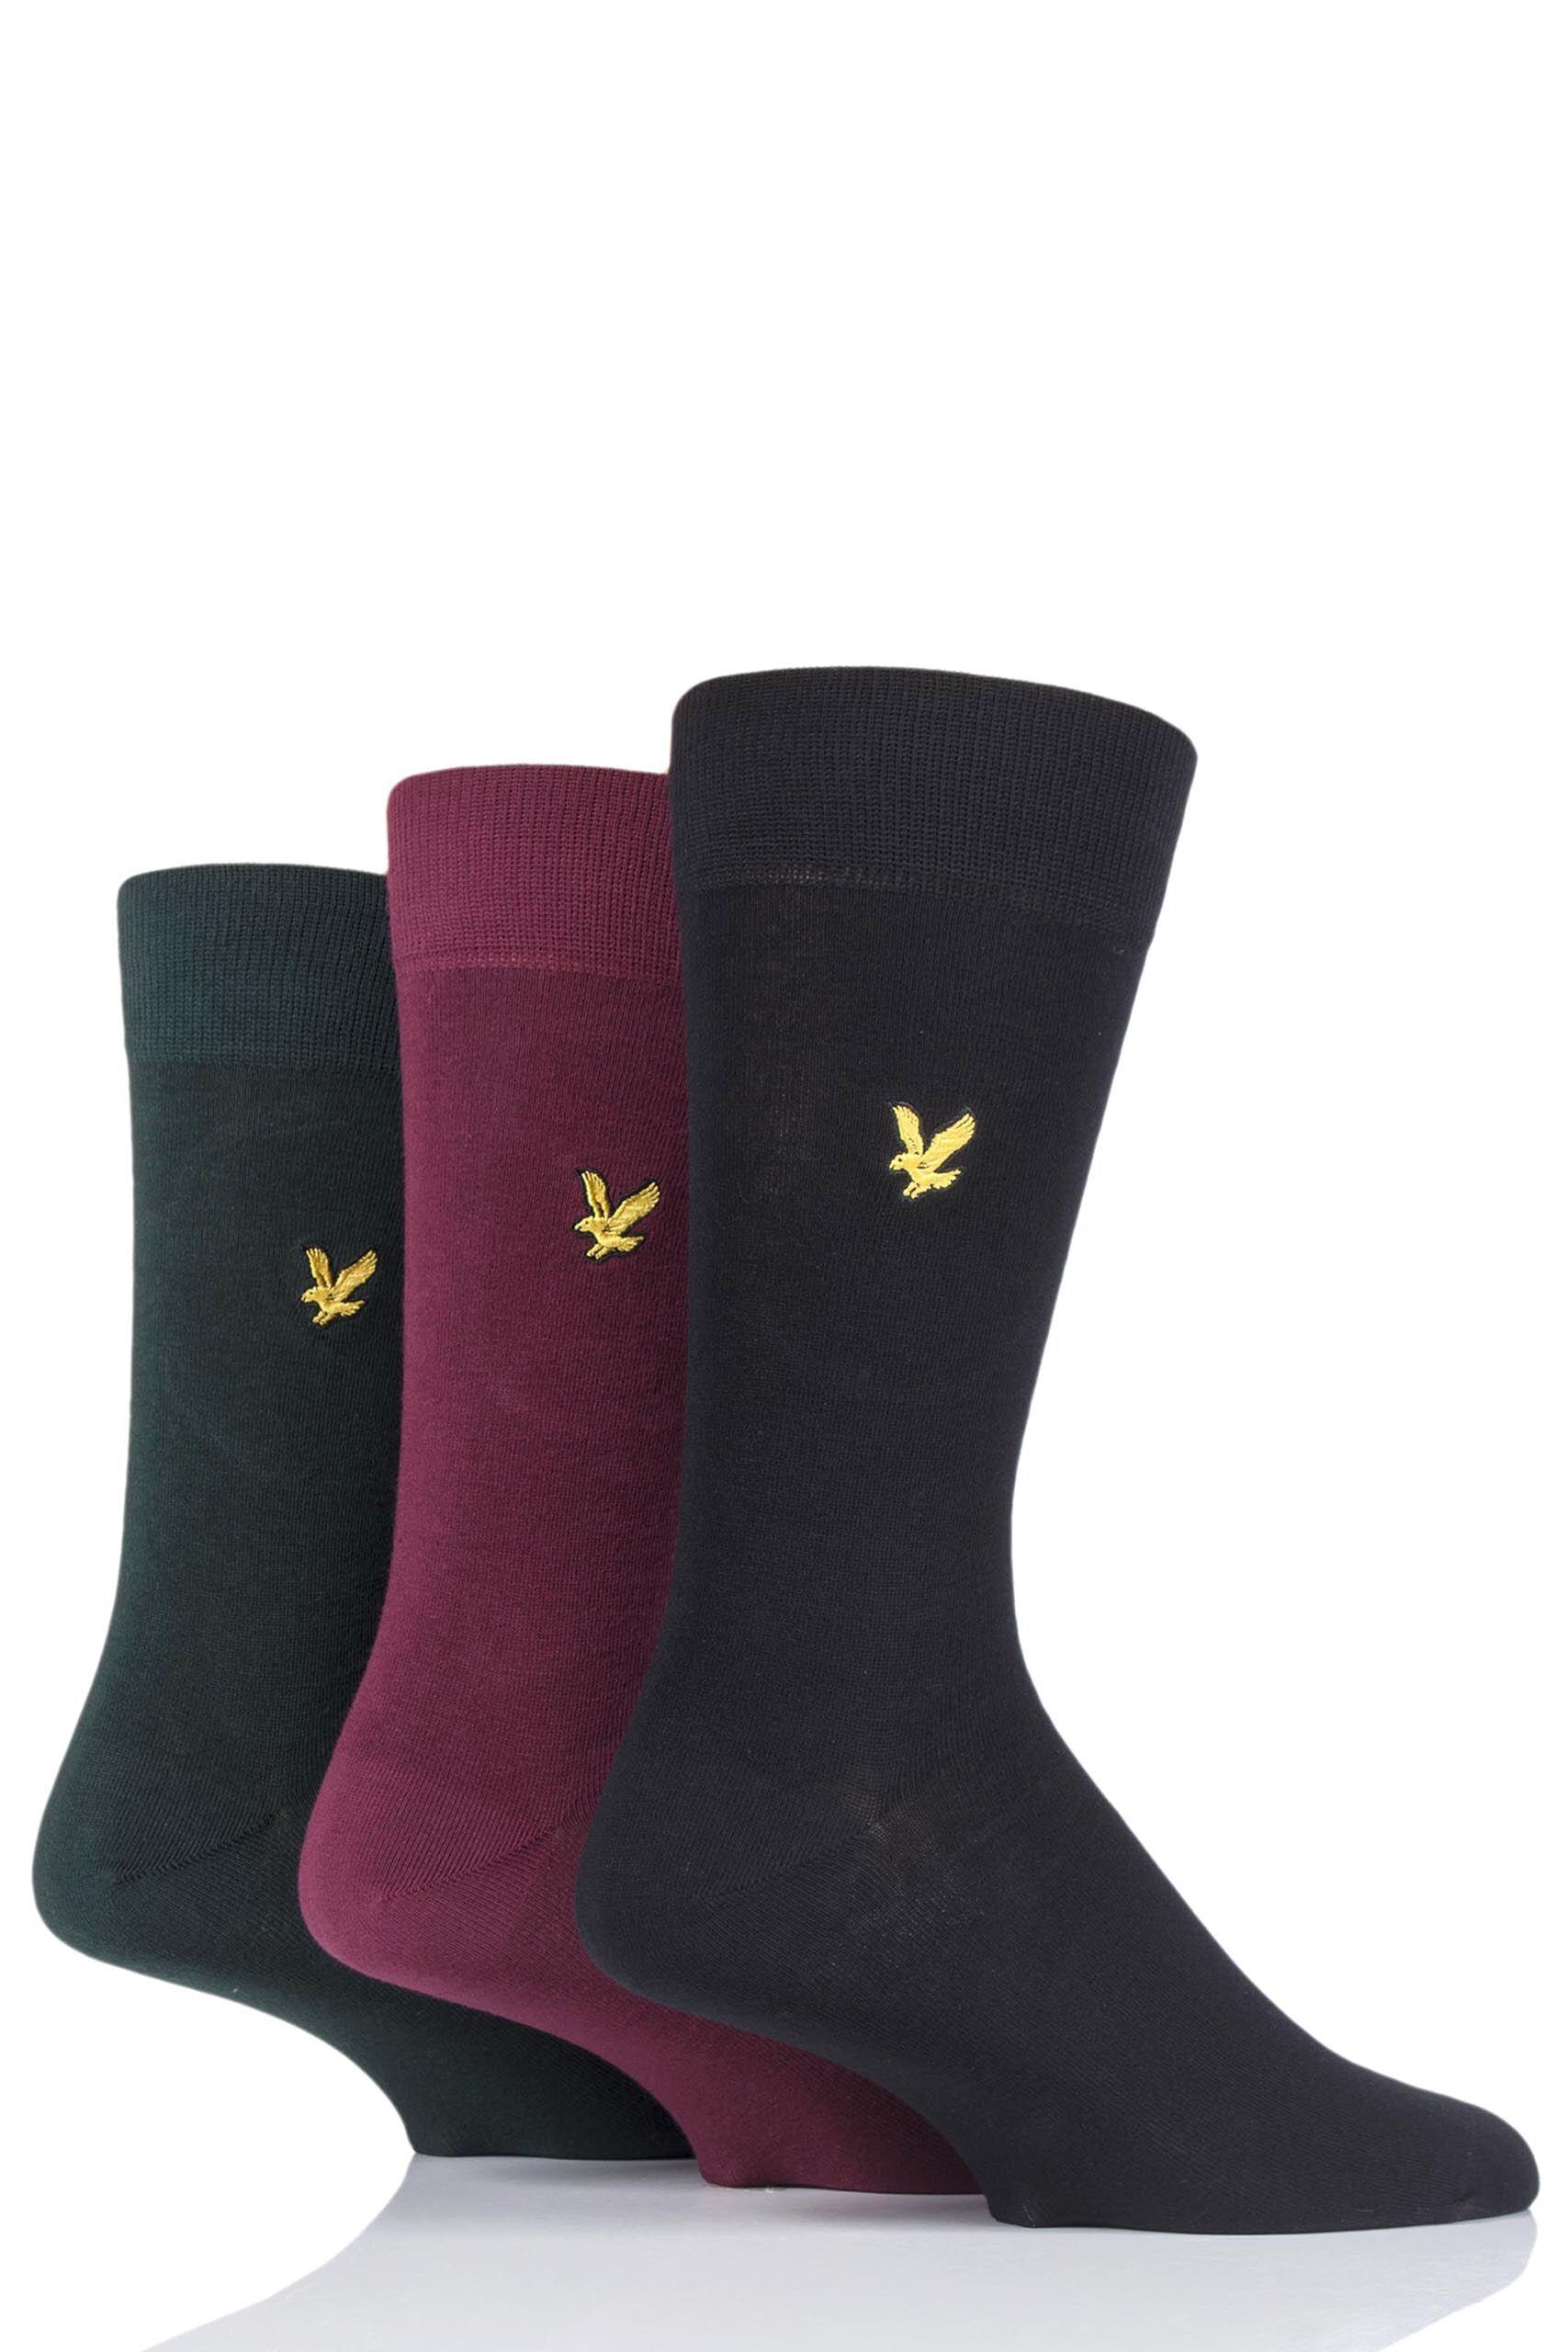 Image of 3 Pair Black Mix Angus Eagle Embroidery Cotton Socks Men's 7-11 Mens - Lyle & Scott